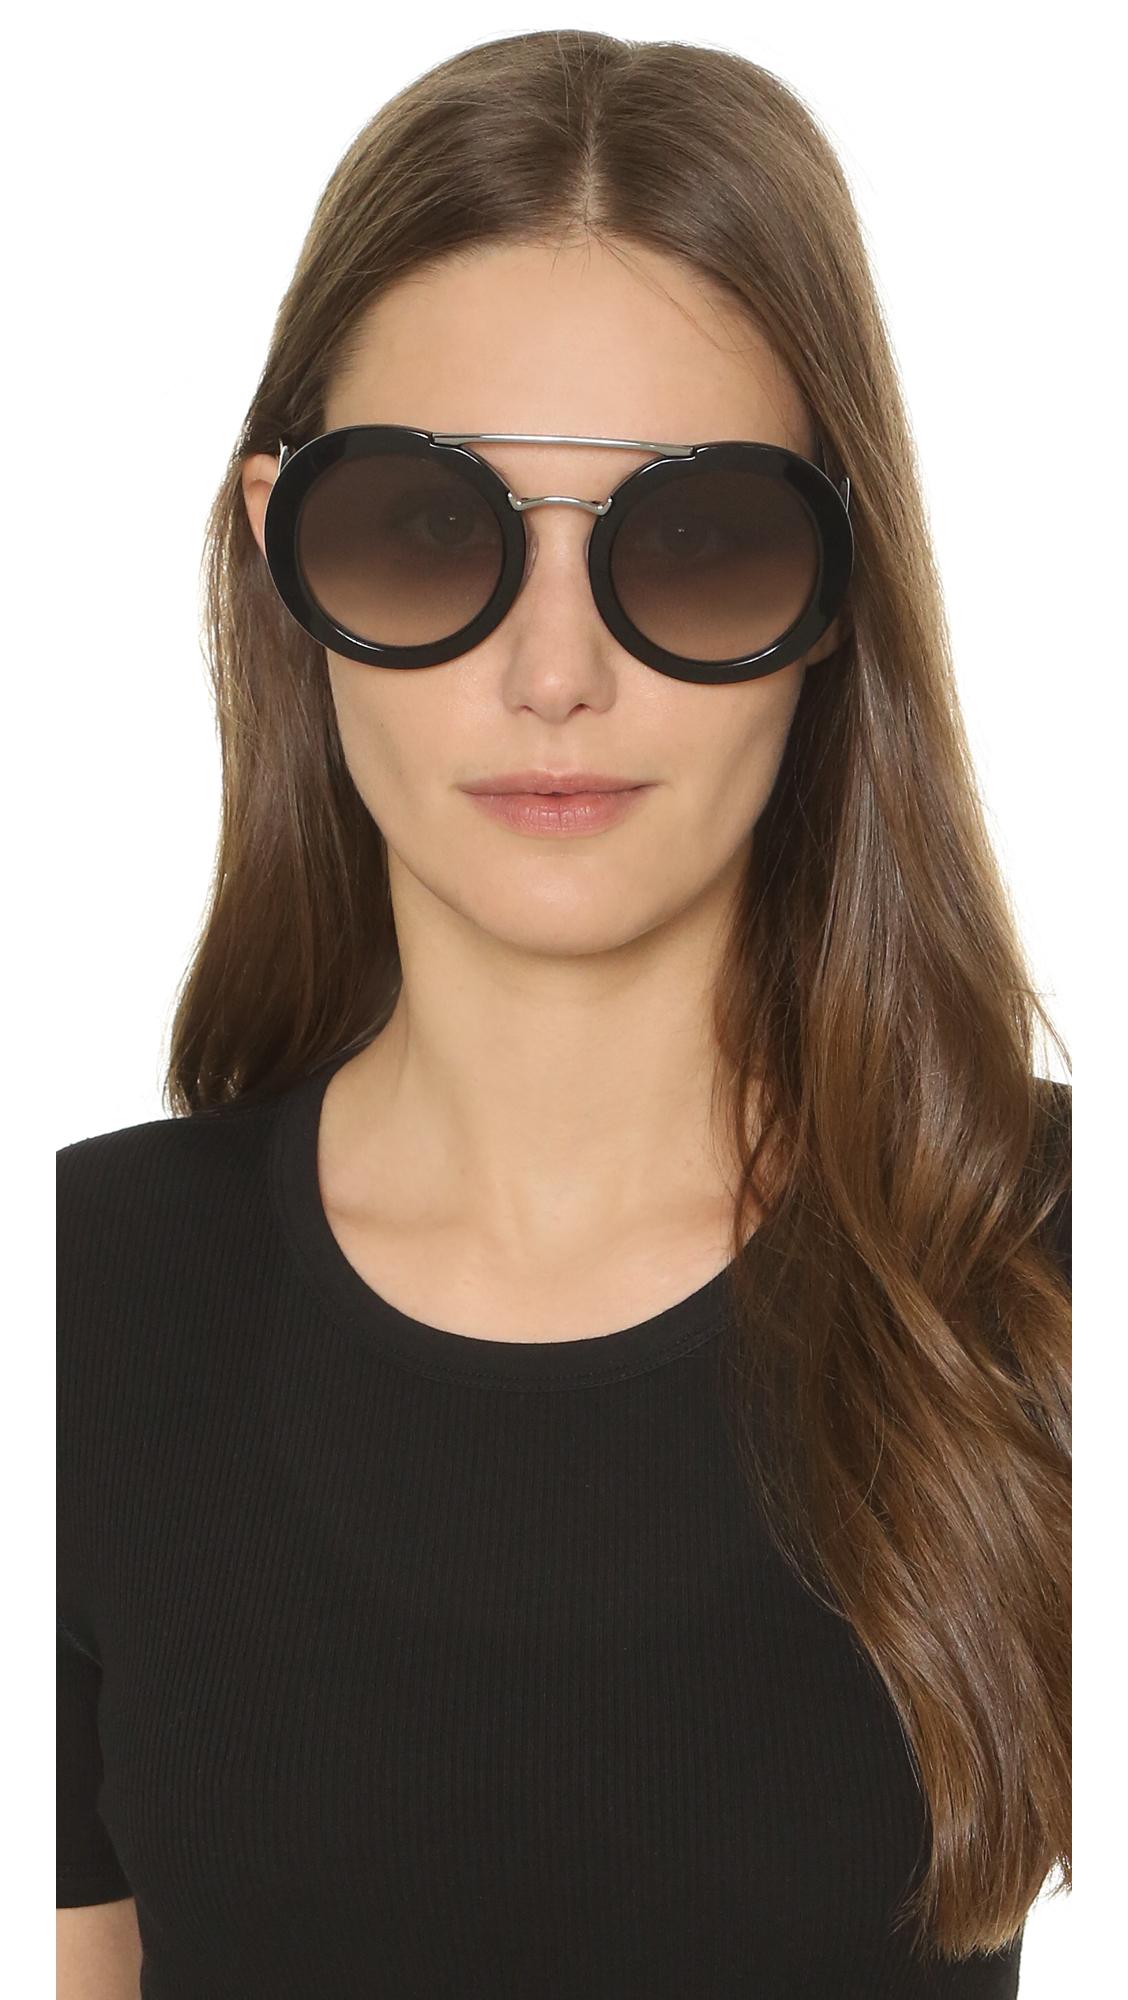 799dace6dc45c Lyst - Prada Catwalk Oversized Sunglasses in Black